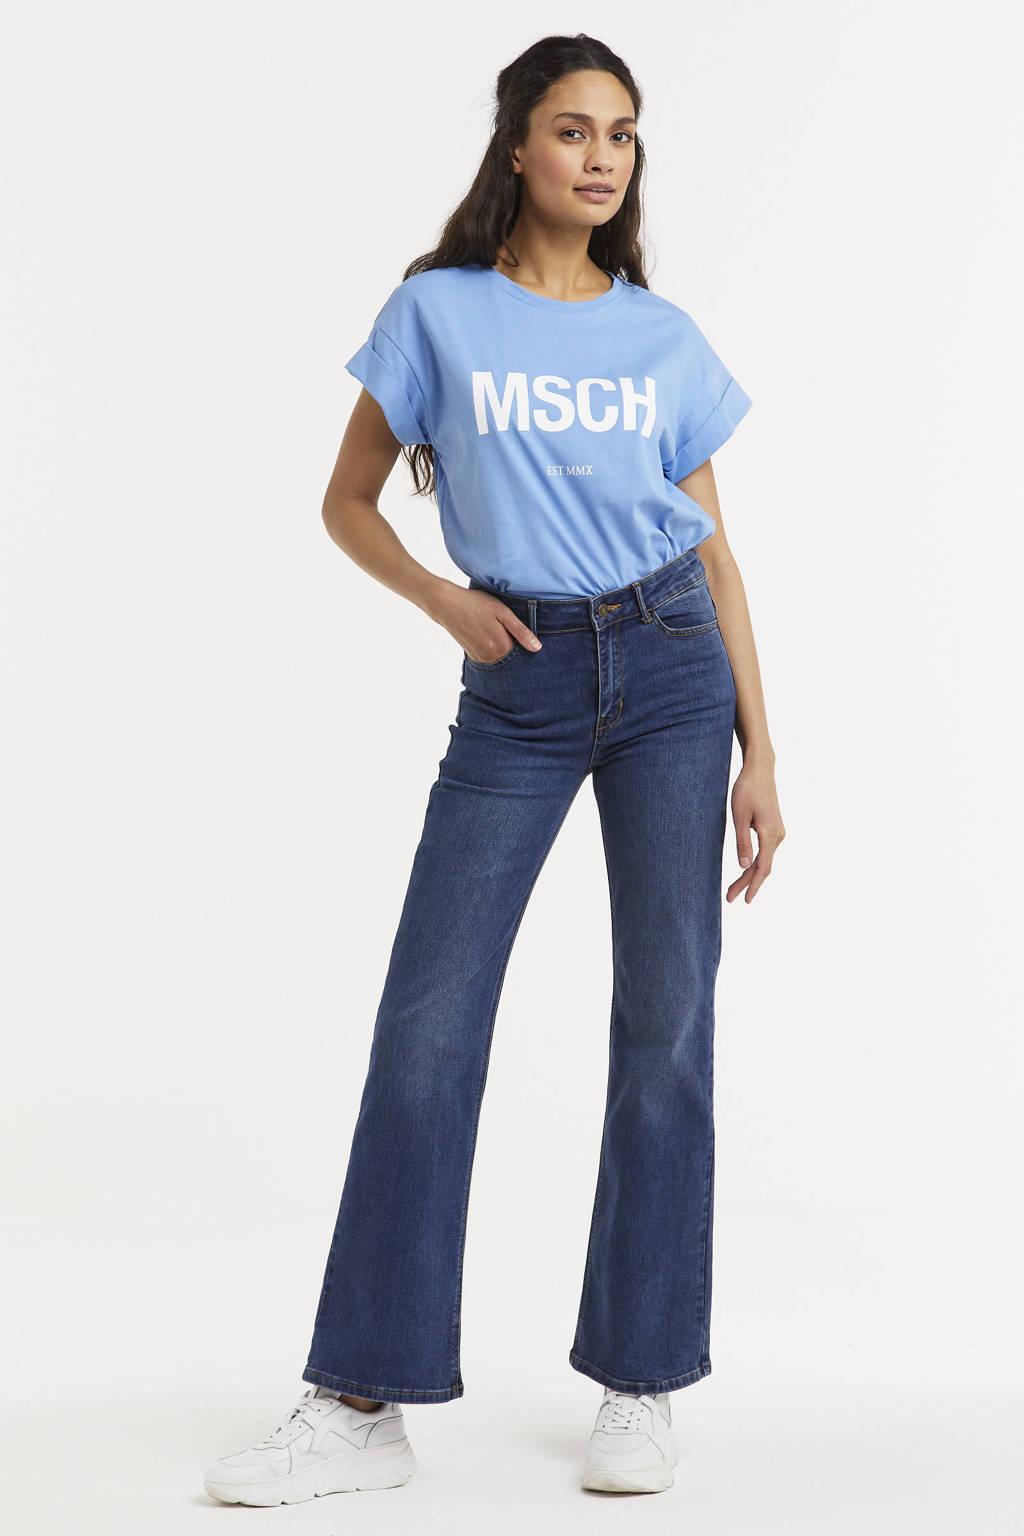 Yest flared jeans Gynne dark denim stonewashed, Dark denim stonewashed